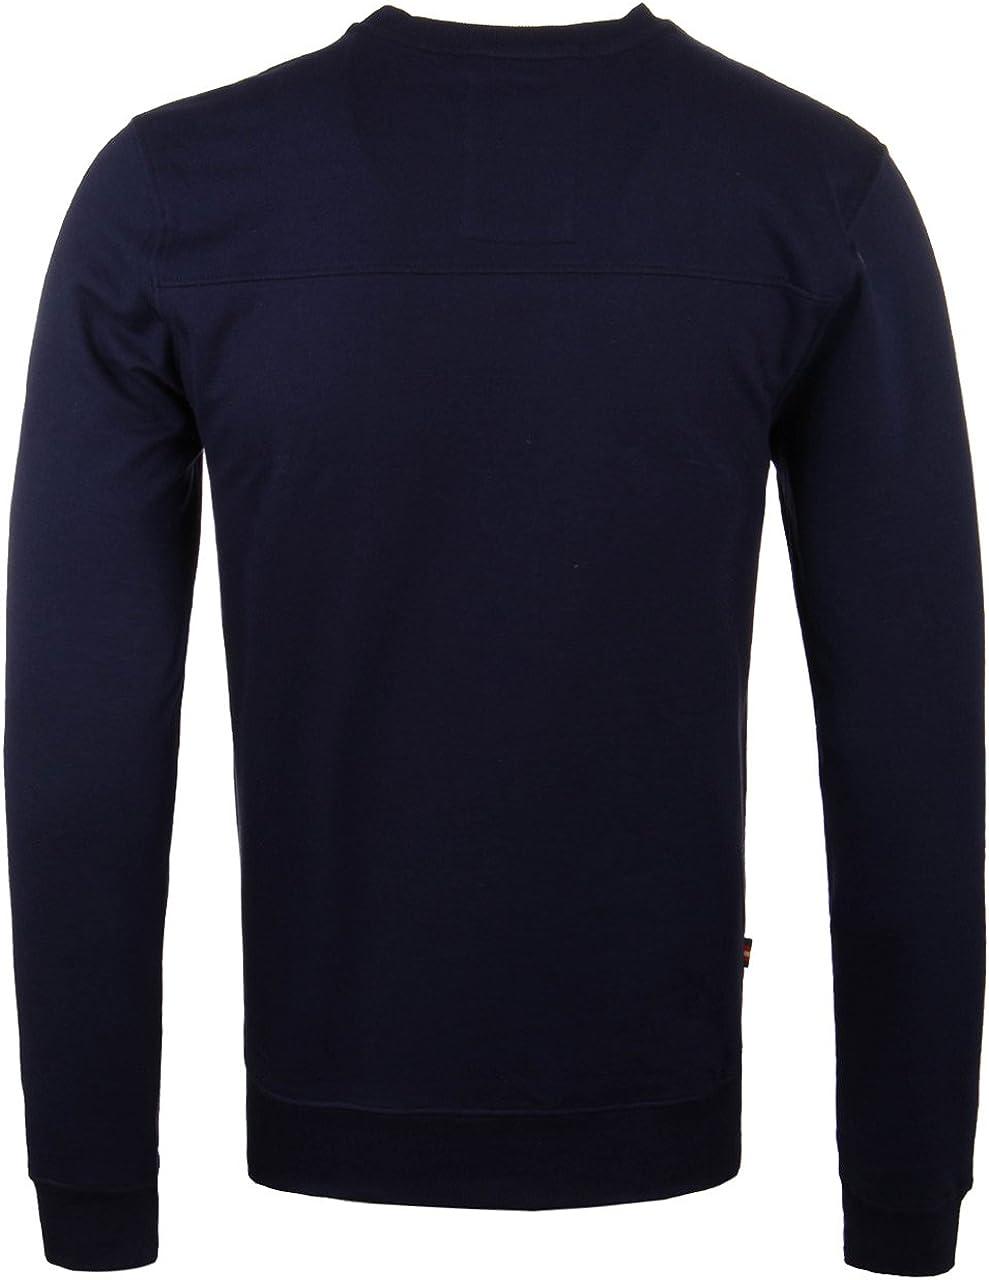 LUKE 1977 Mens The Runner Crew Neck Basic Long Sleeve Sweatshirt Top